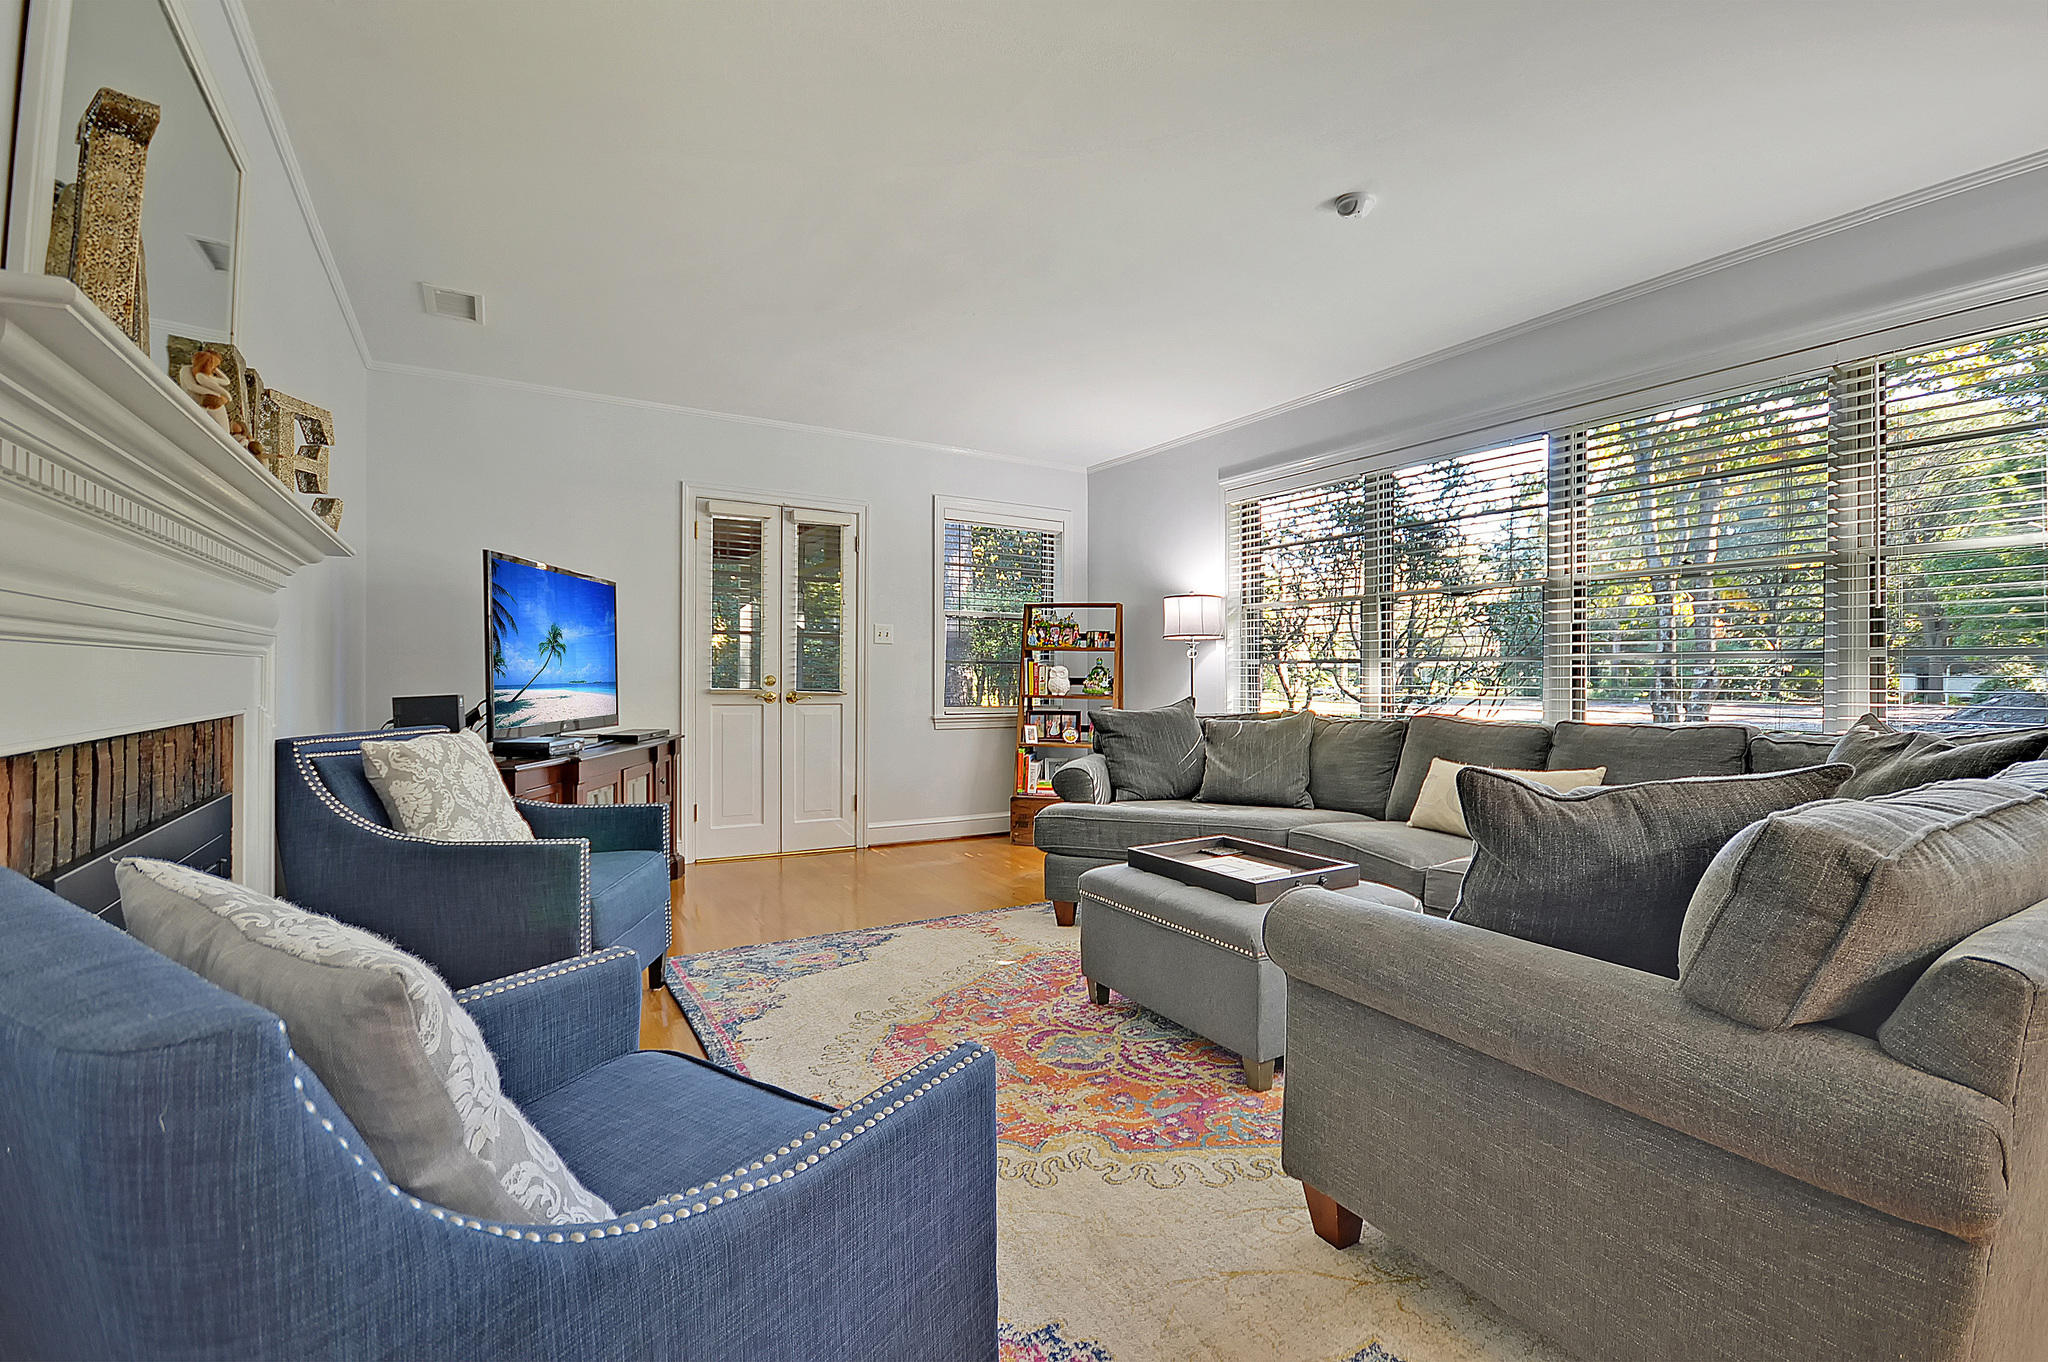 Edgewater Park Homes For Sale - 1356 Emory, Charleston, SC - 49